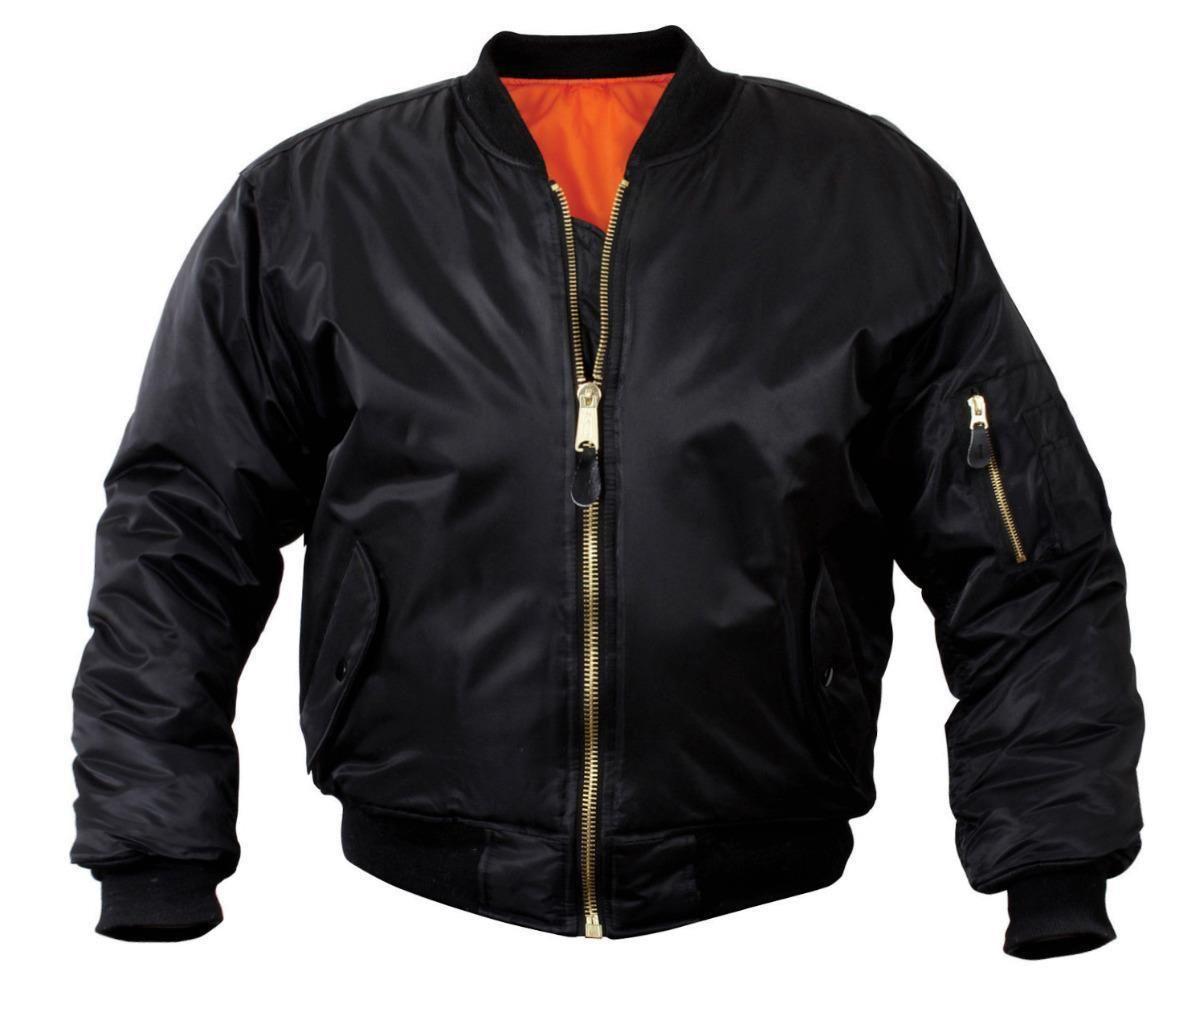 New Men S Military Army Air Force Ma 1 Slim Fit Pilot Bomber Black Coat Jacket Bomber Jacket Flight Jacket Flight Bomber Jacket [ 1024 x 1204 Pixel ]